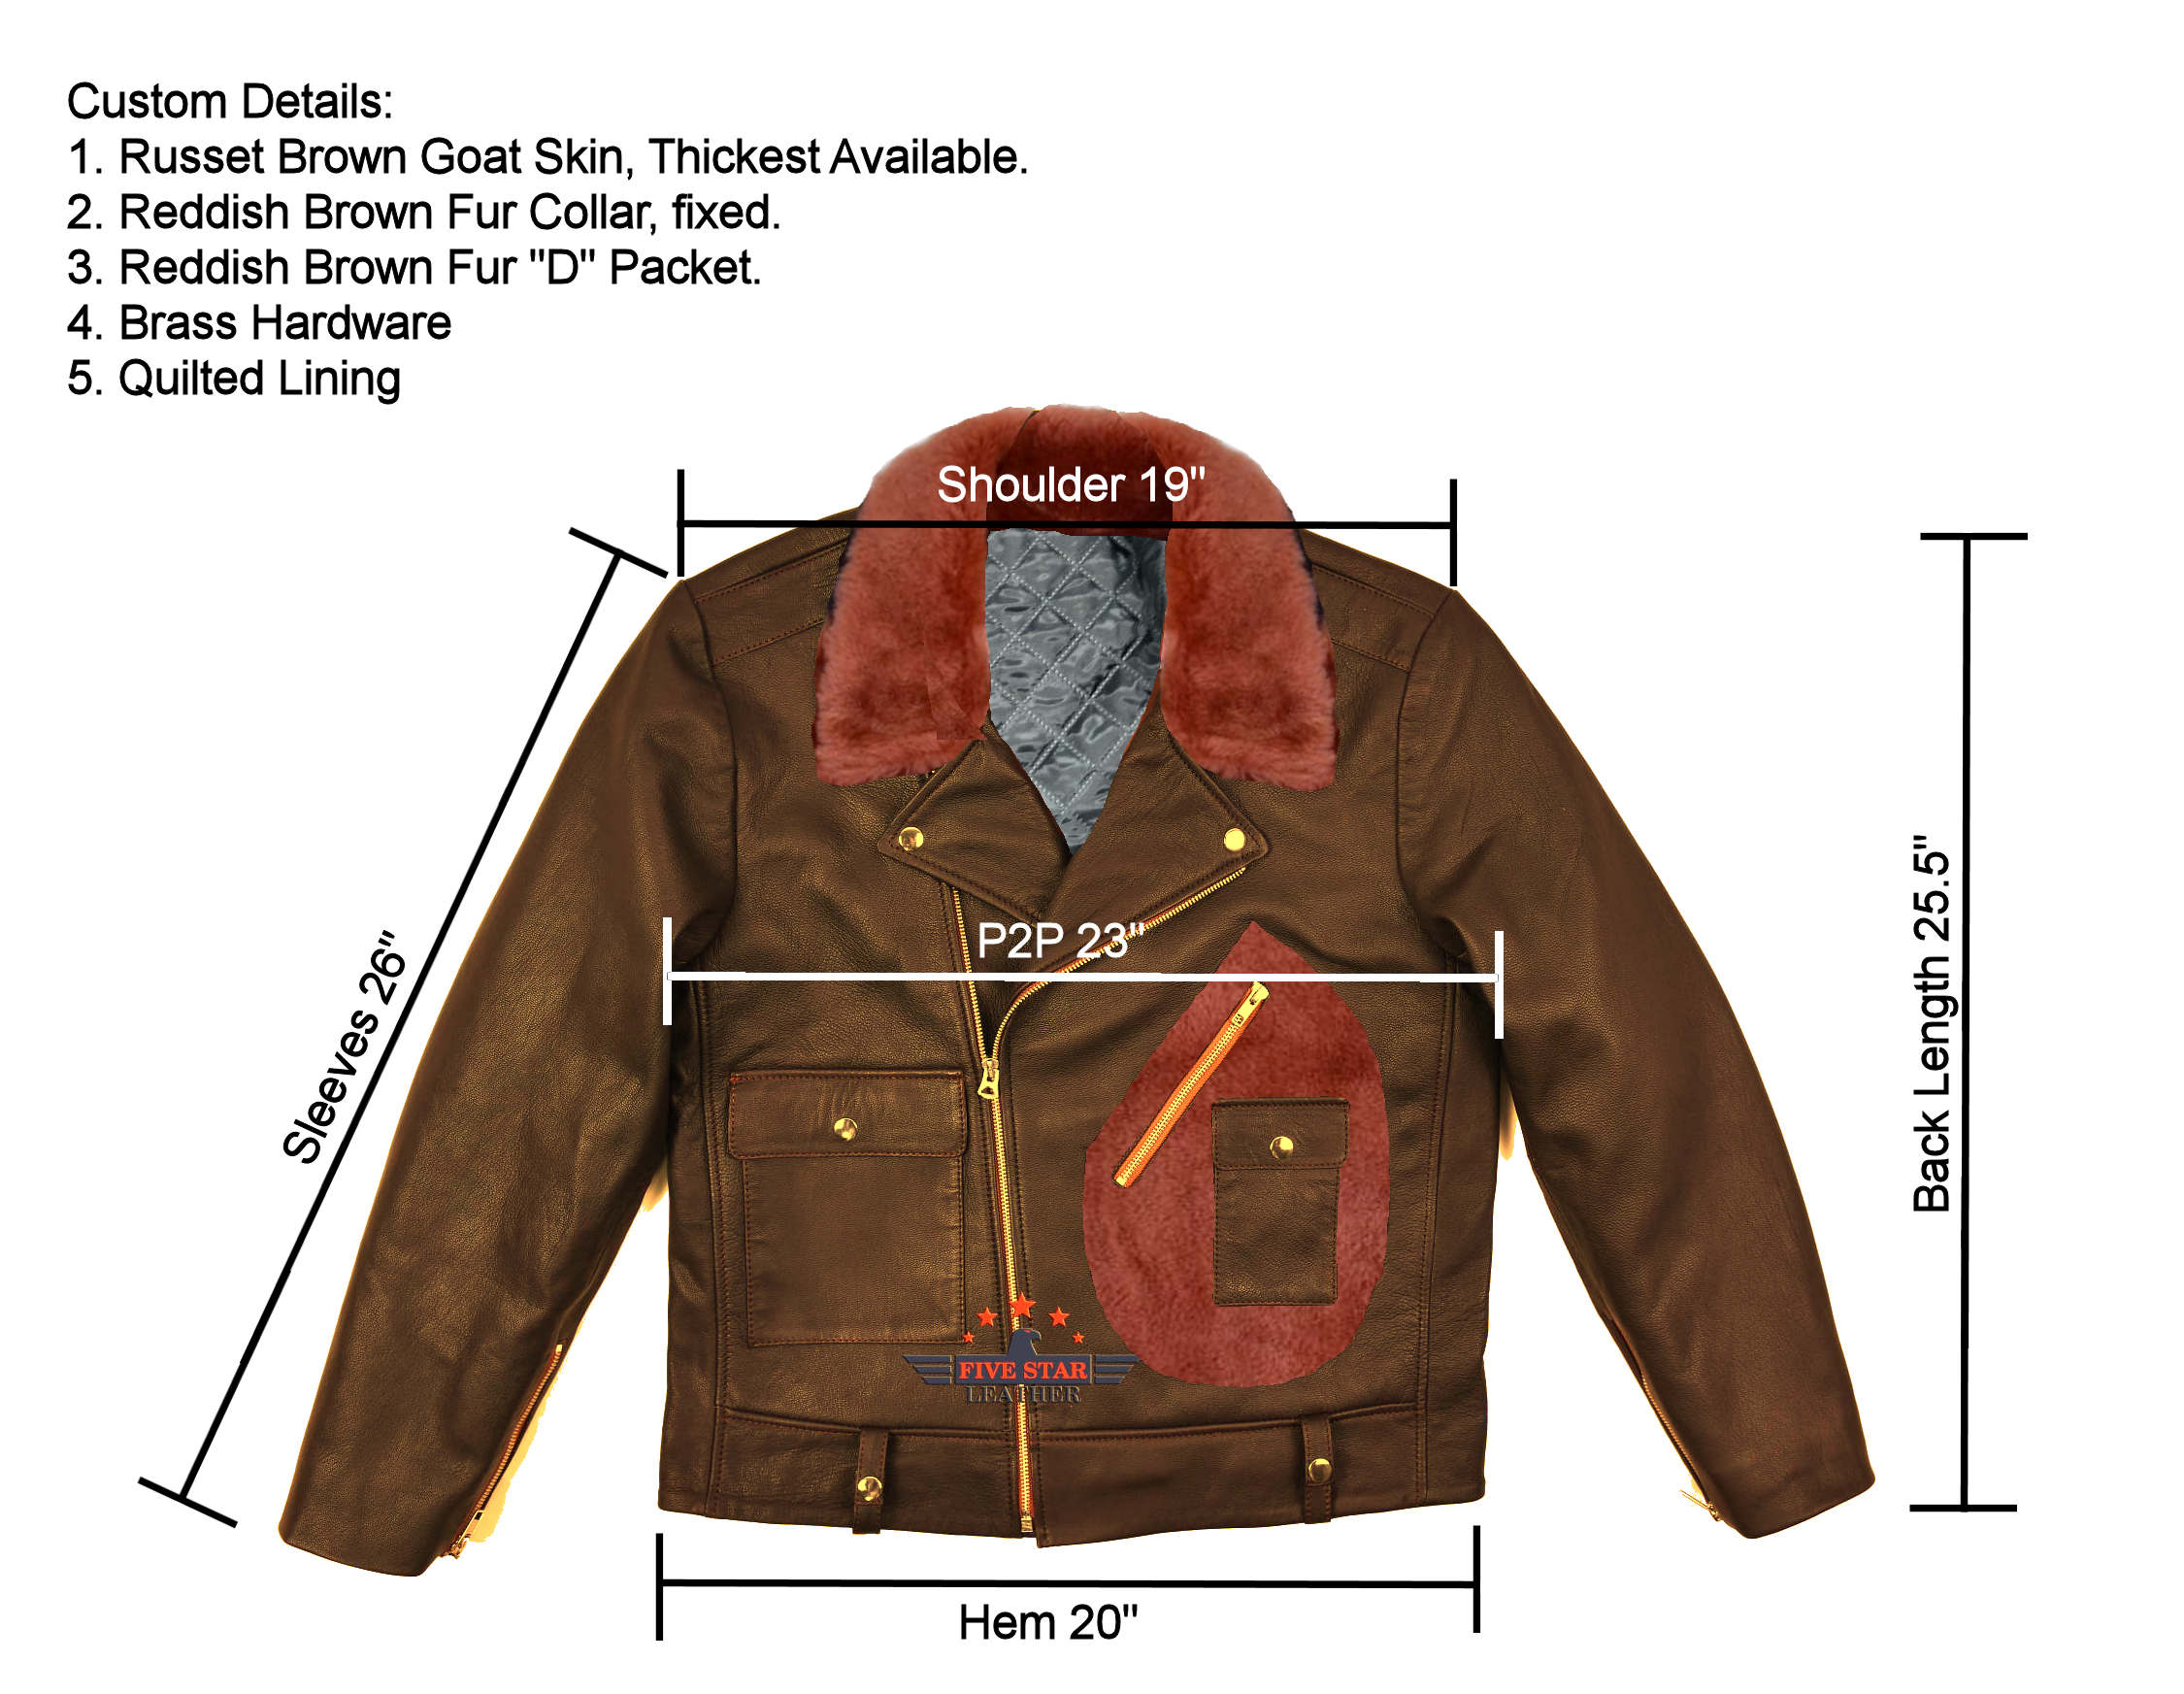 Five Star Beck Jacket Custom Details.jpg